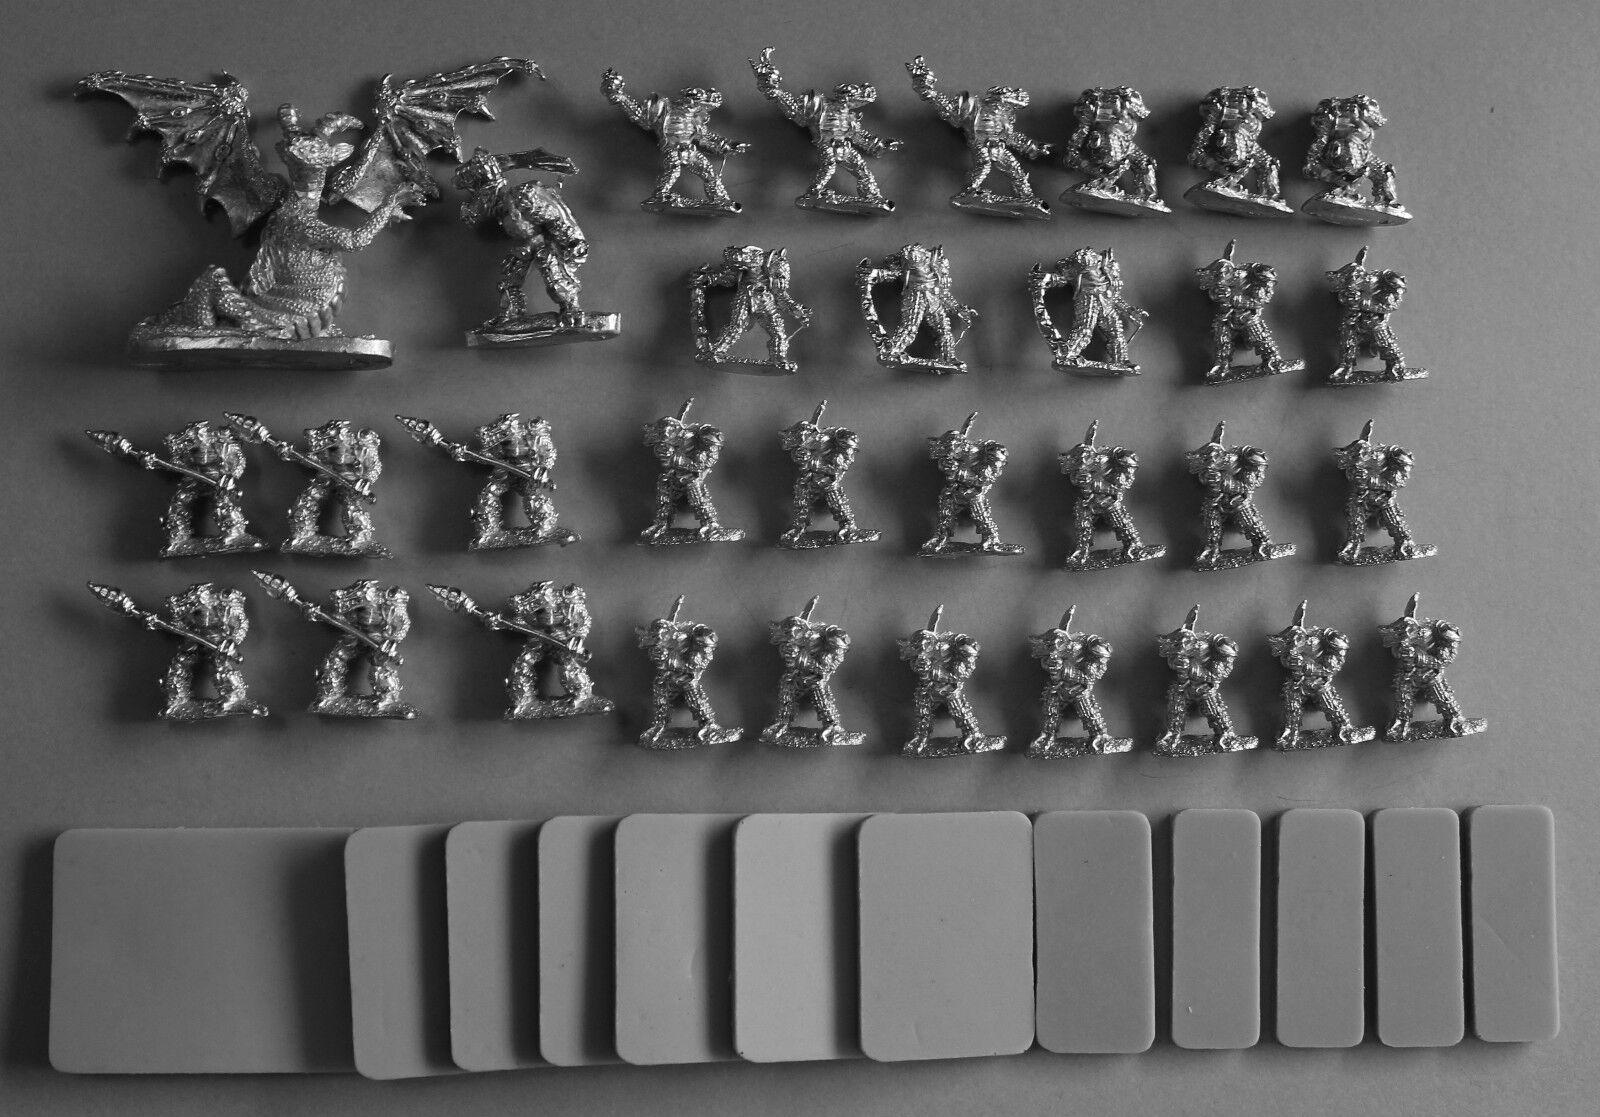 15mm HOTT 1010 DRAGONMAN DRACCI ARMY-Unpainted-Fantasy HOTT 24AP Army-UNPAINTED Army-UNPAINTED Army-UNPAINTED 7cc15a